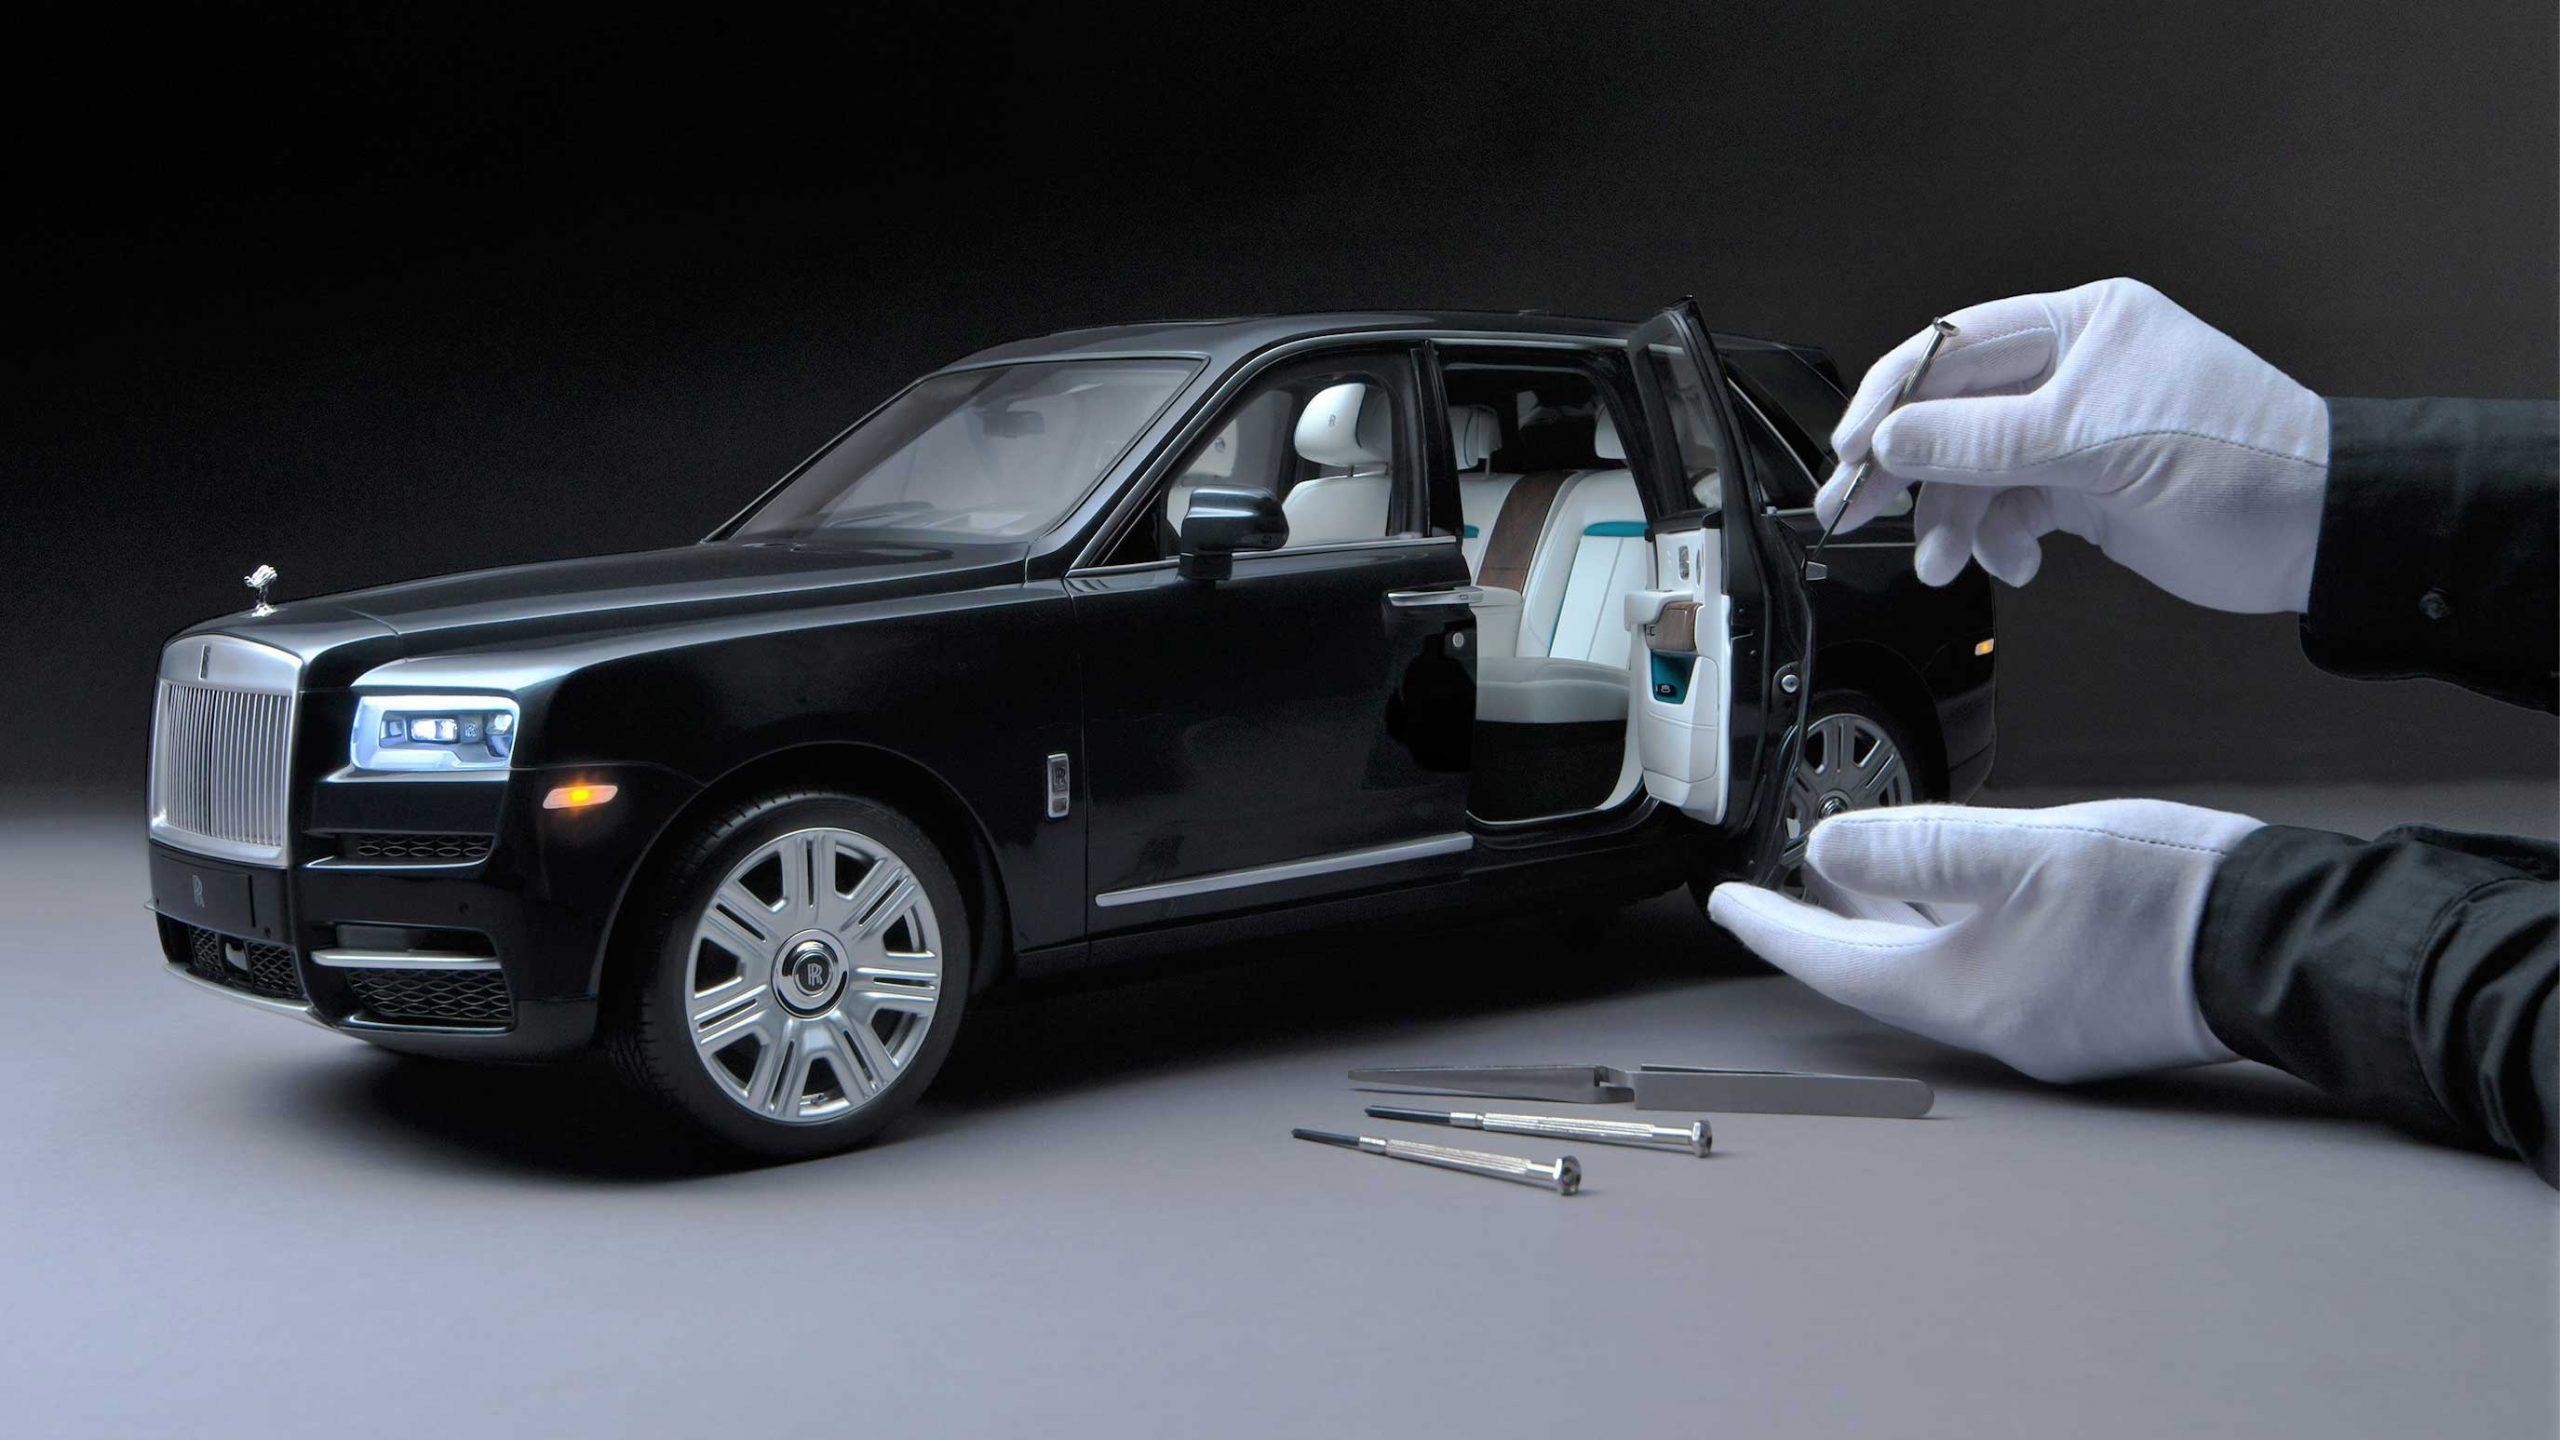 Rolls Royce Cullinan modelo a escala